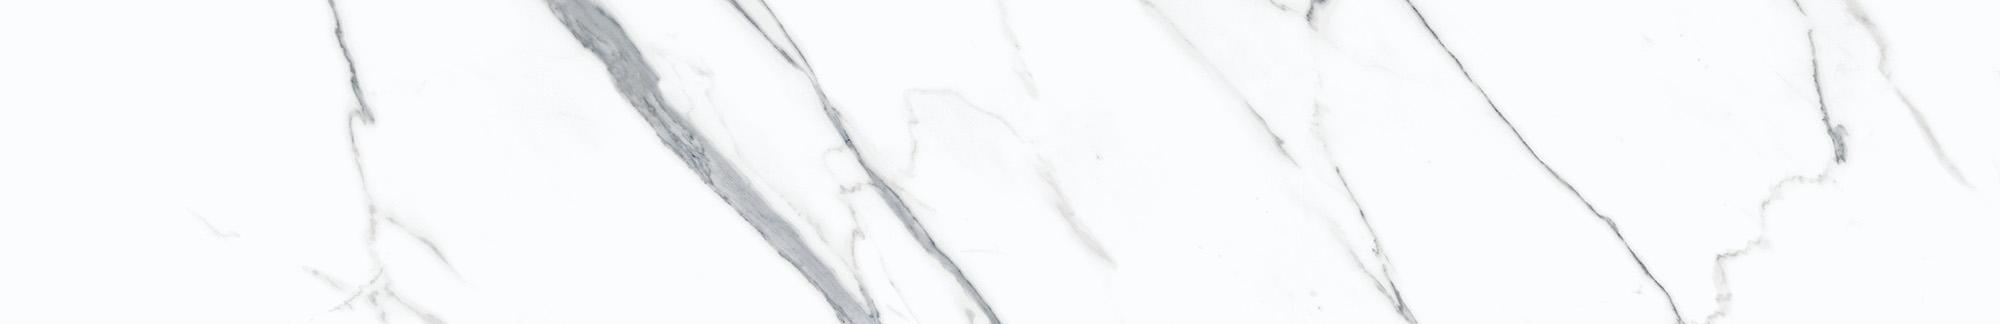 8881/16, Bernini Stone, Valkoinen, lattia